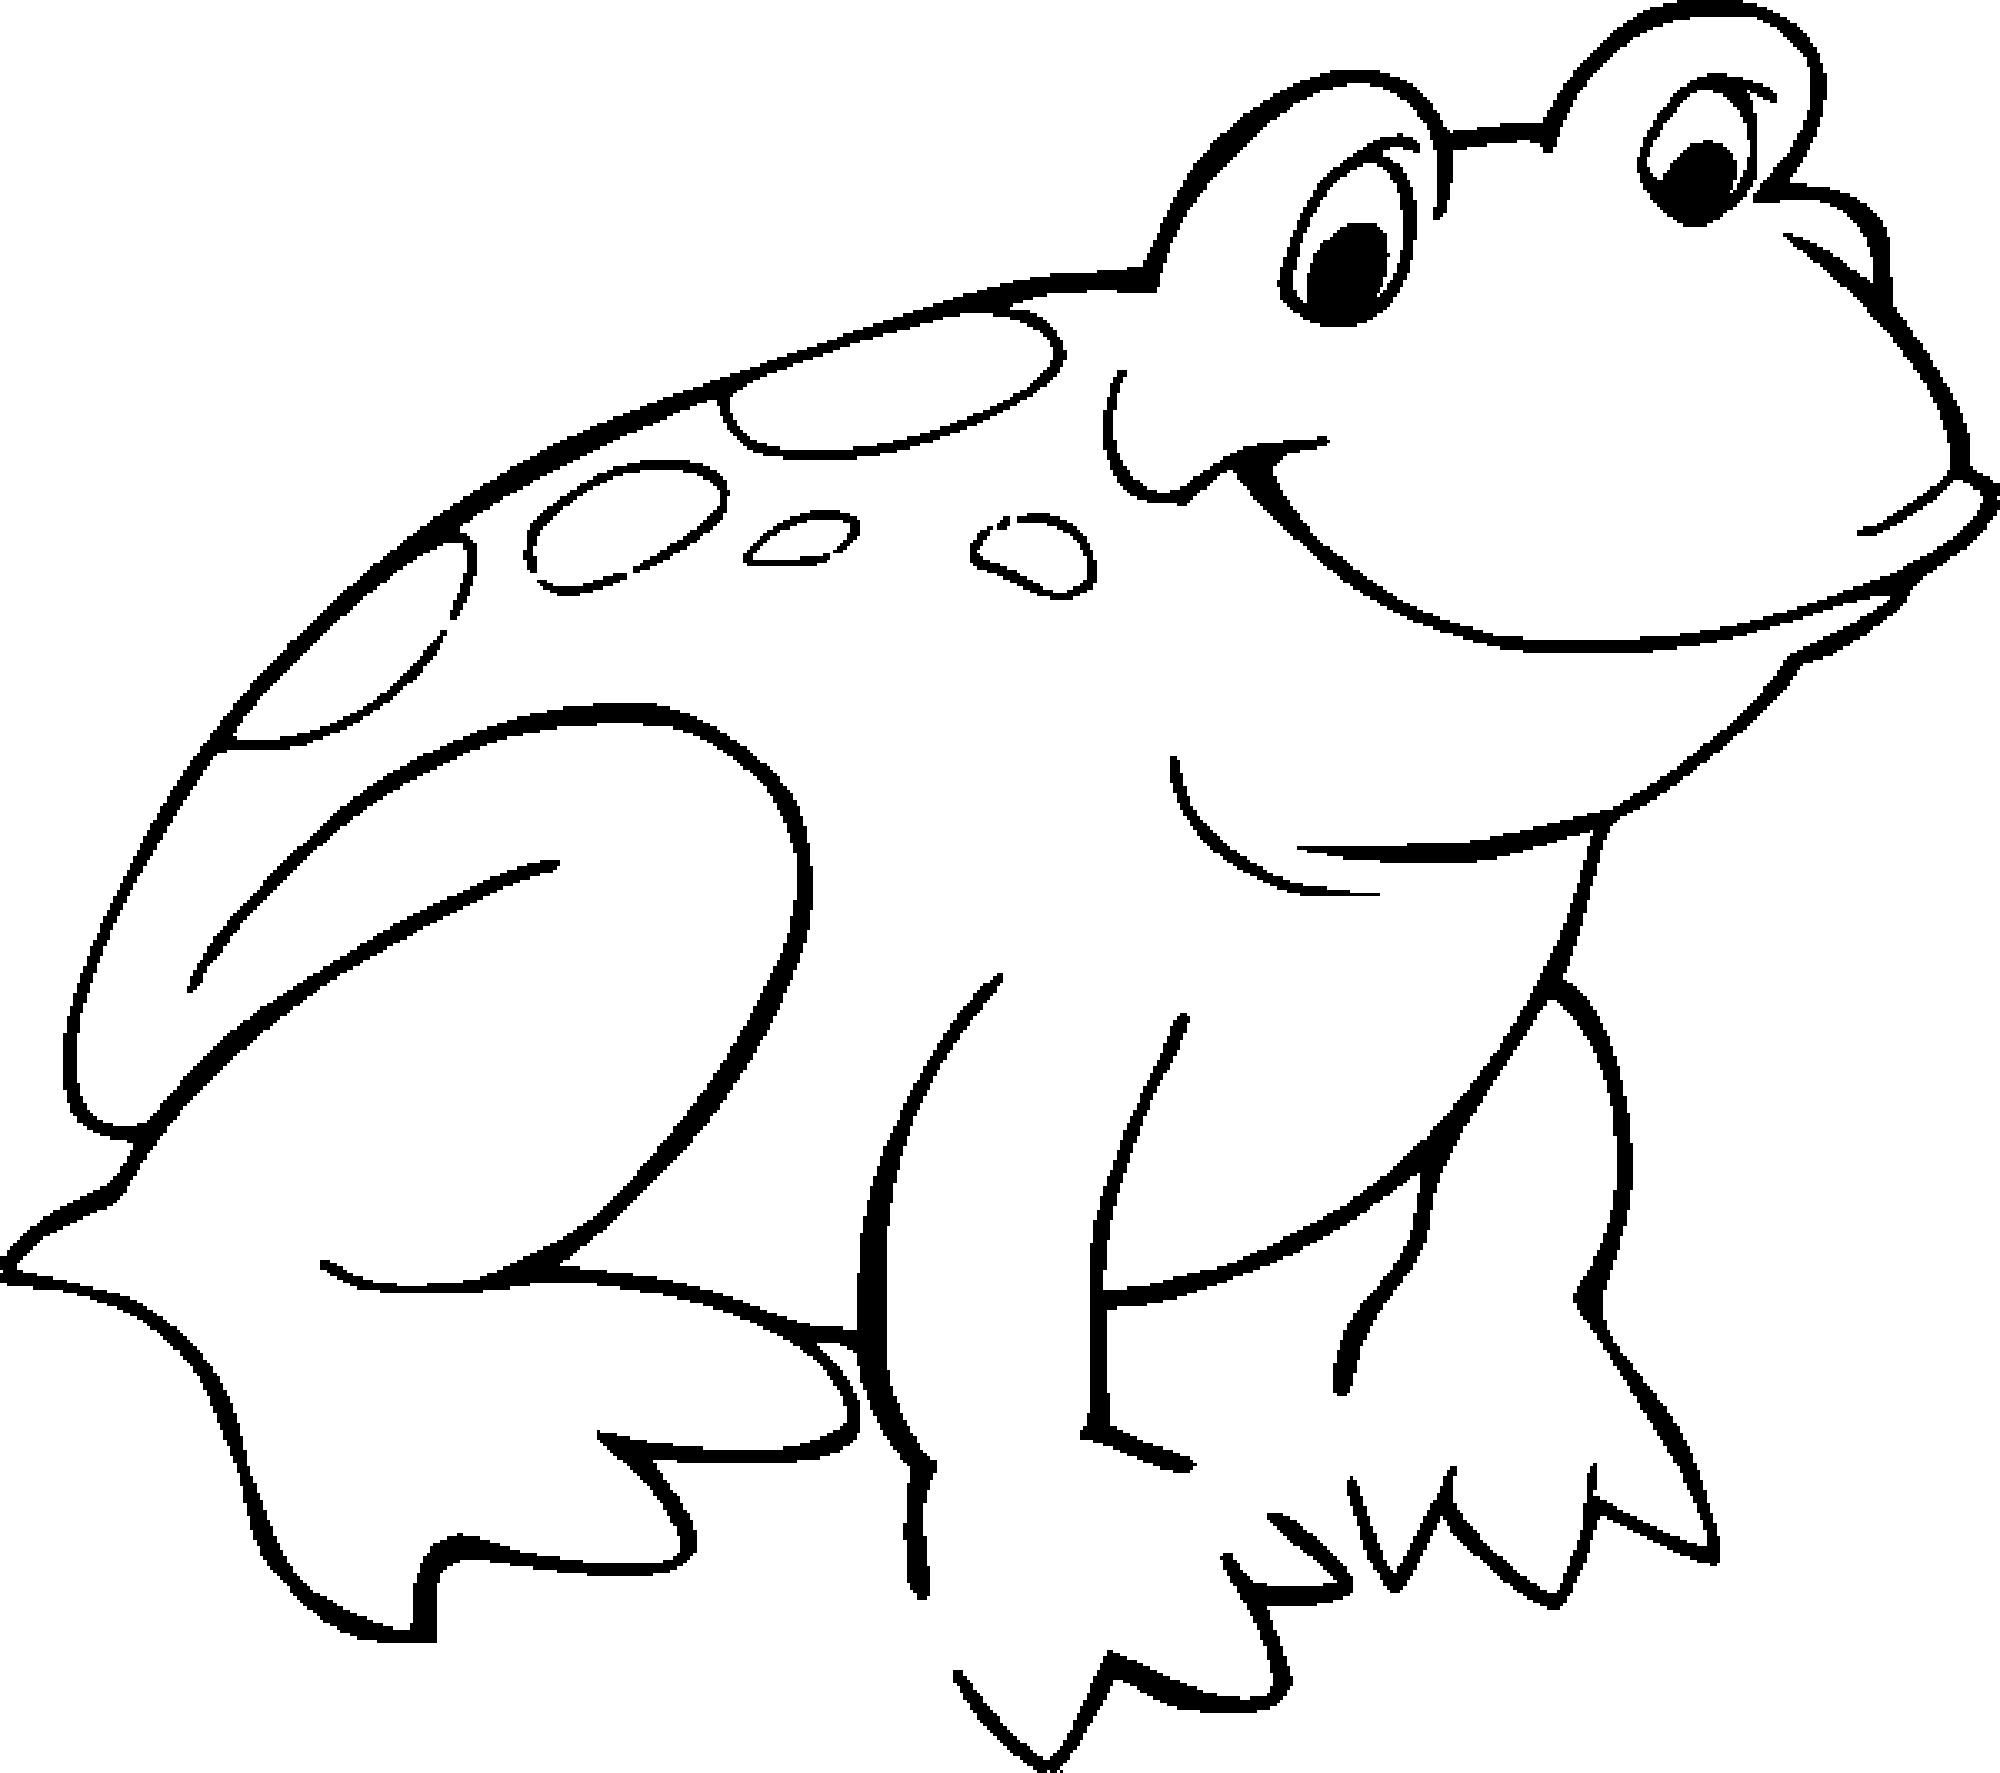 Green Frog coloring #4, Download drawings